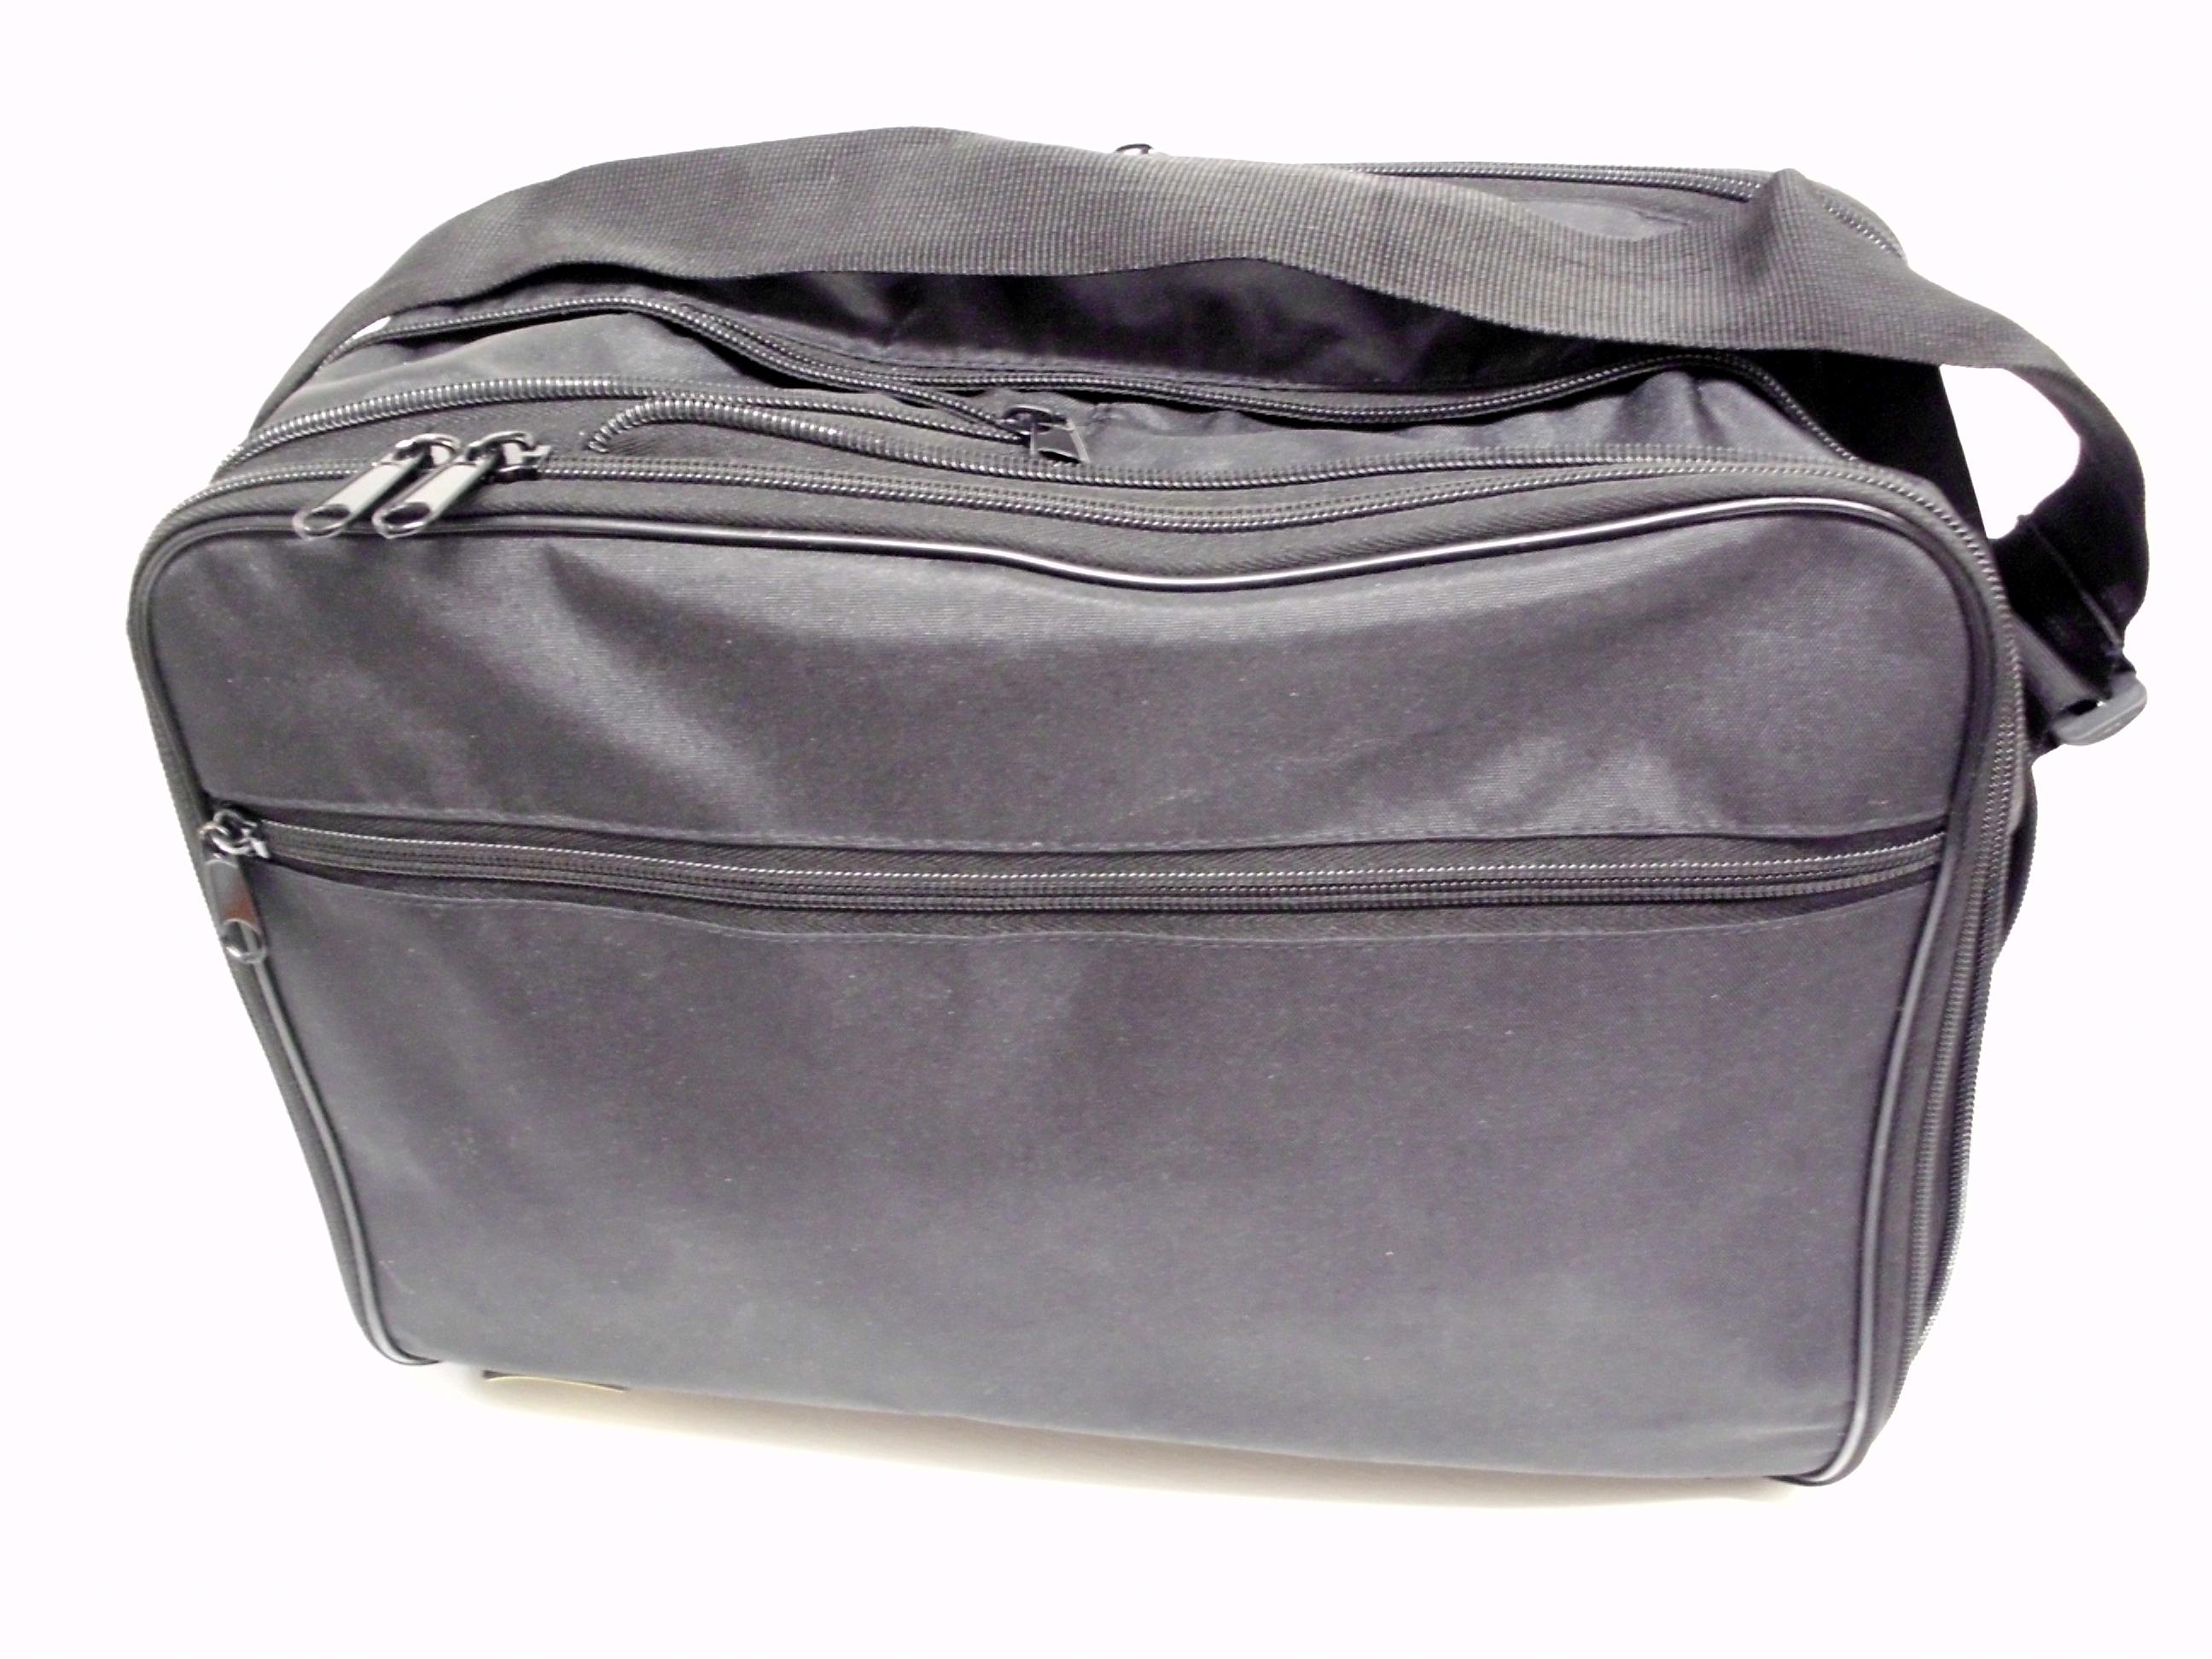 erledigt koffer innentaschen f r bmw vario koffer. Black Bedroom Furniture Sets. Home Design Ideas